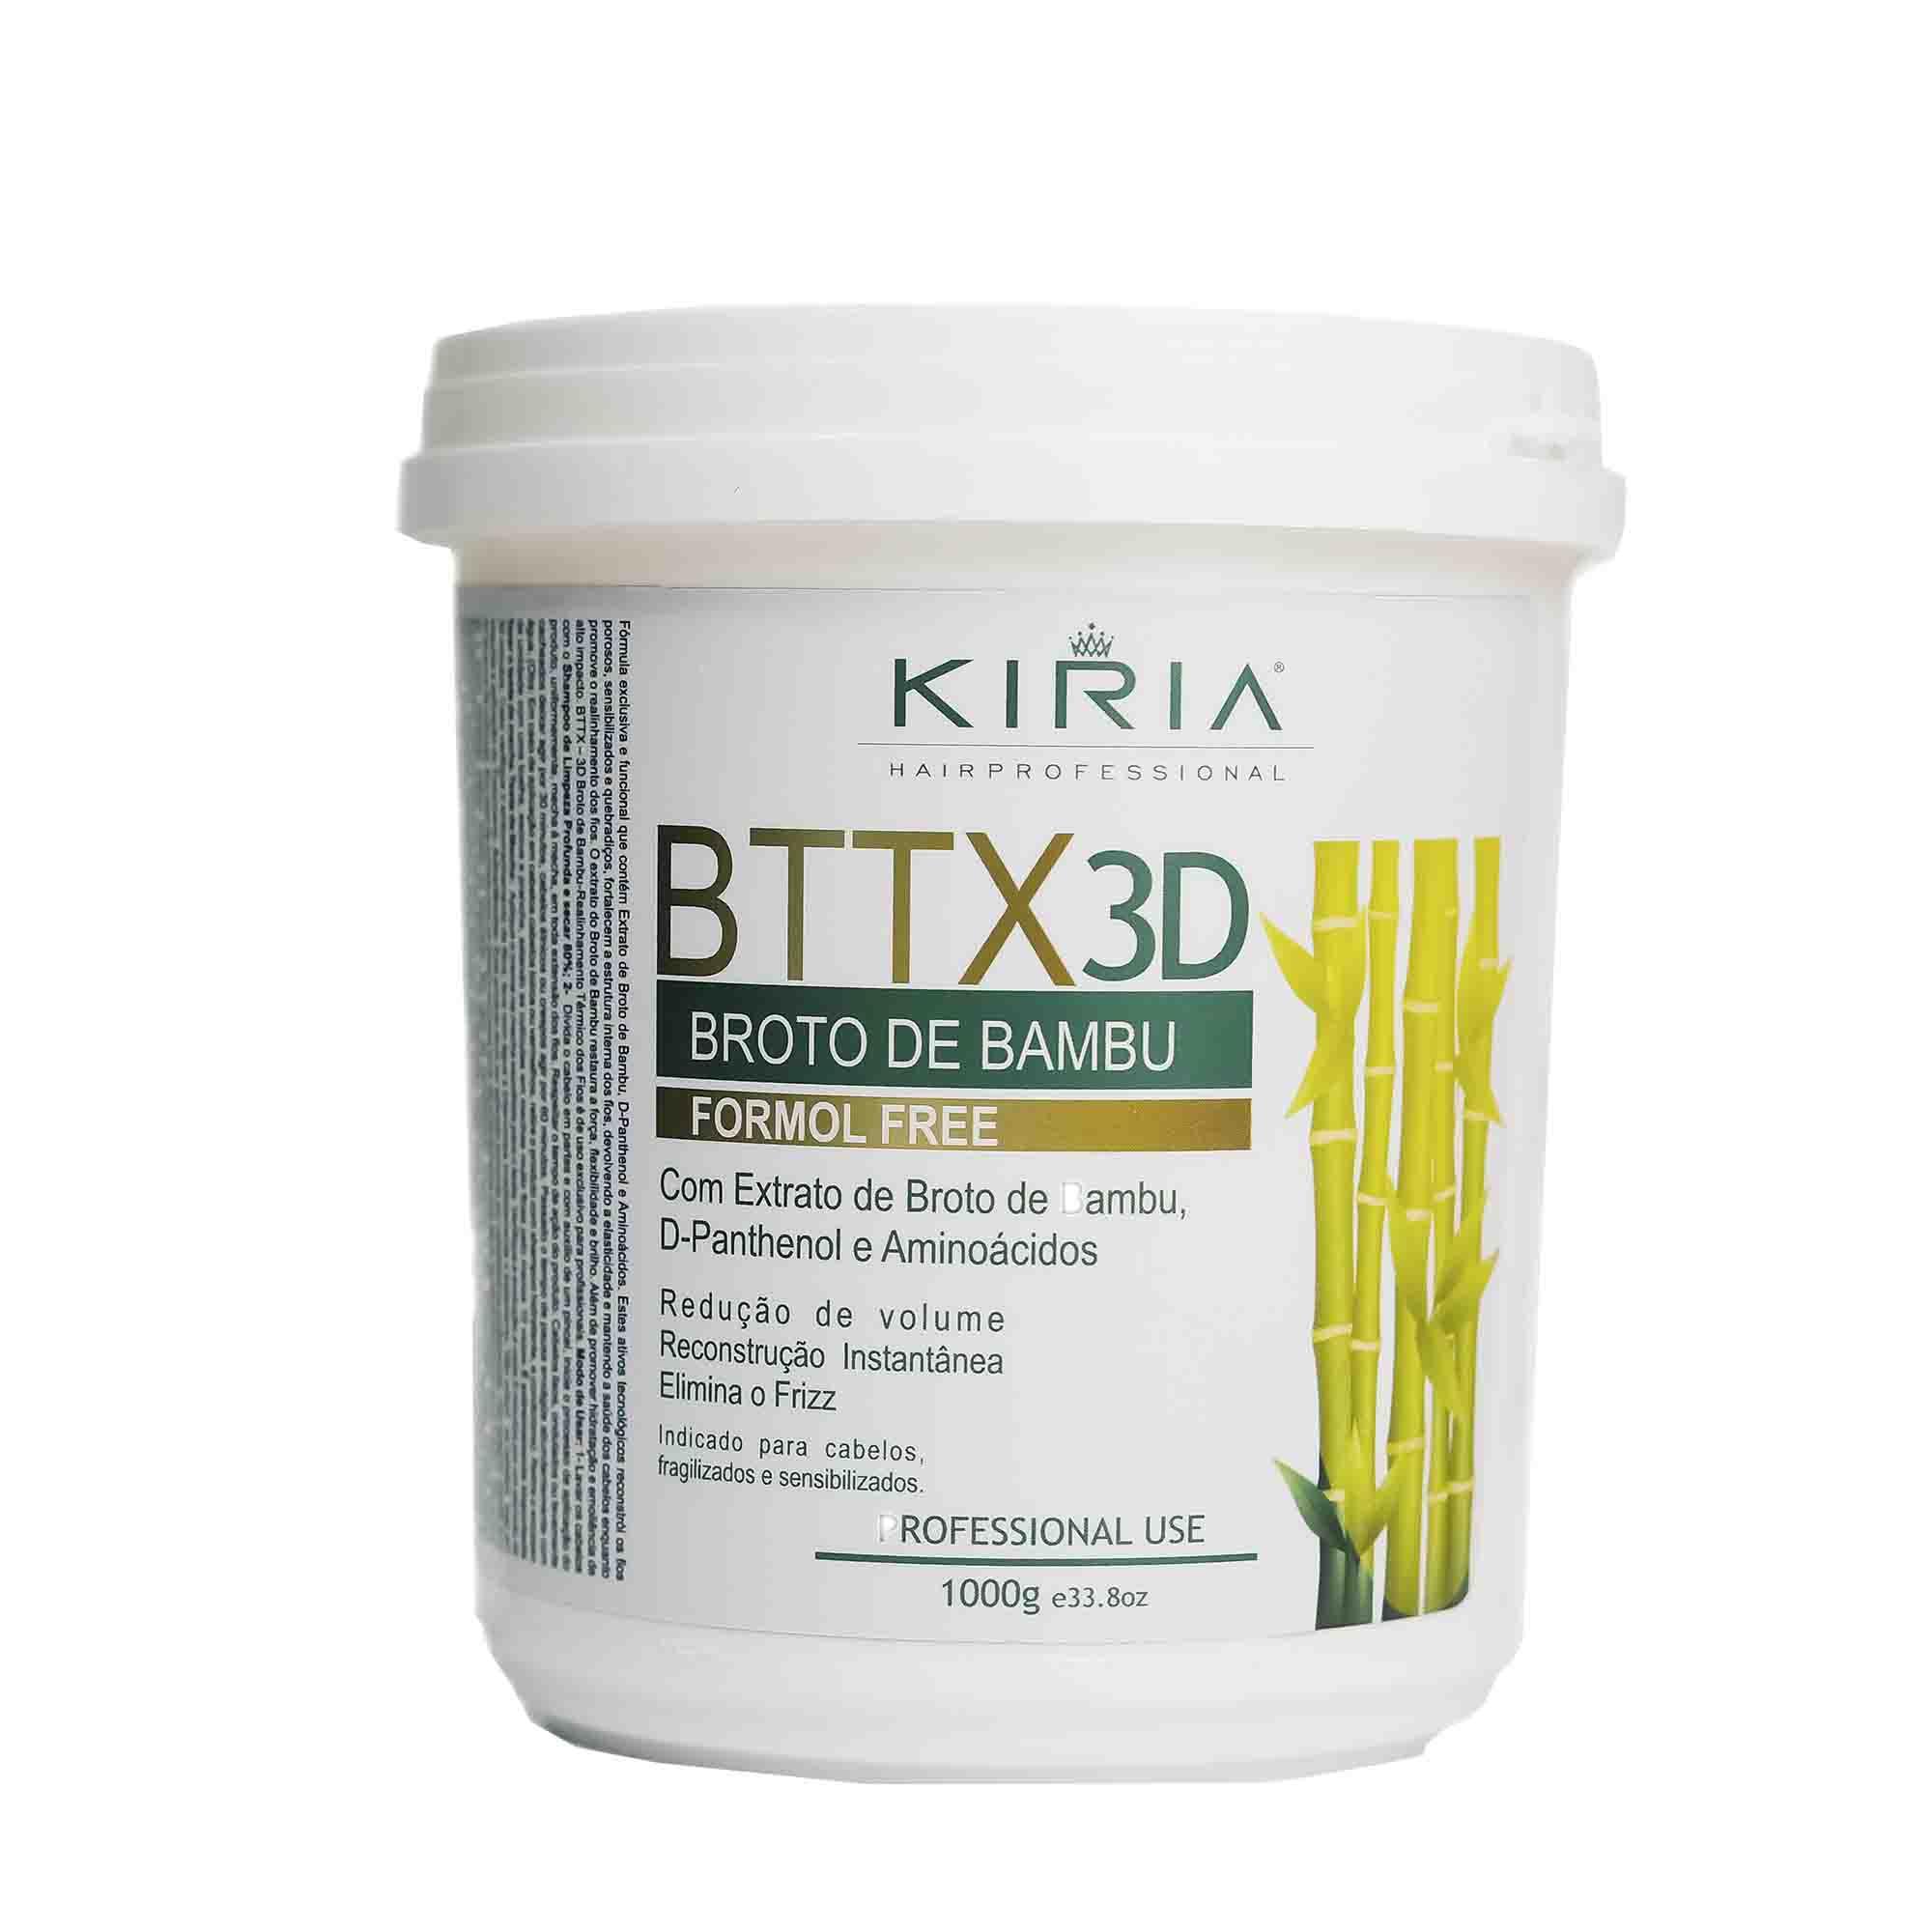 BTTX 3D BROTO DE BAMBU FORMOL FREE - 1000G